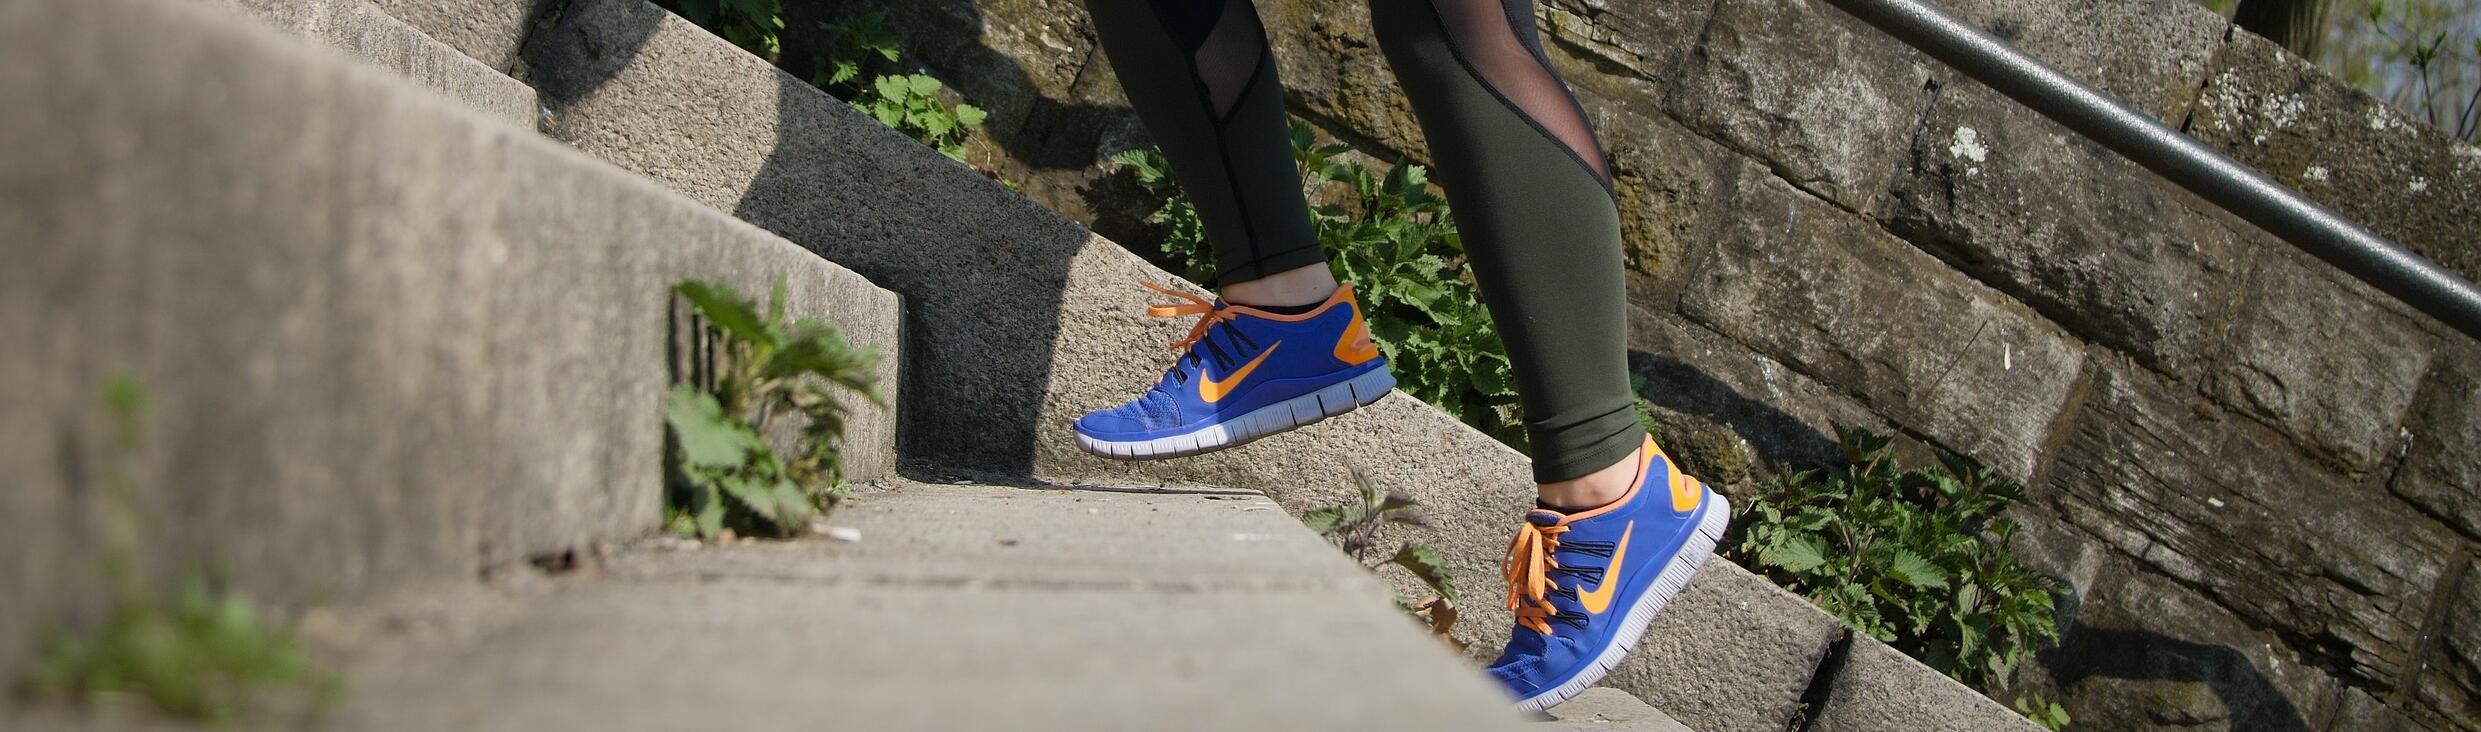 Sportvoeding marathon